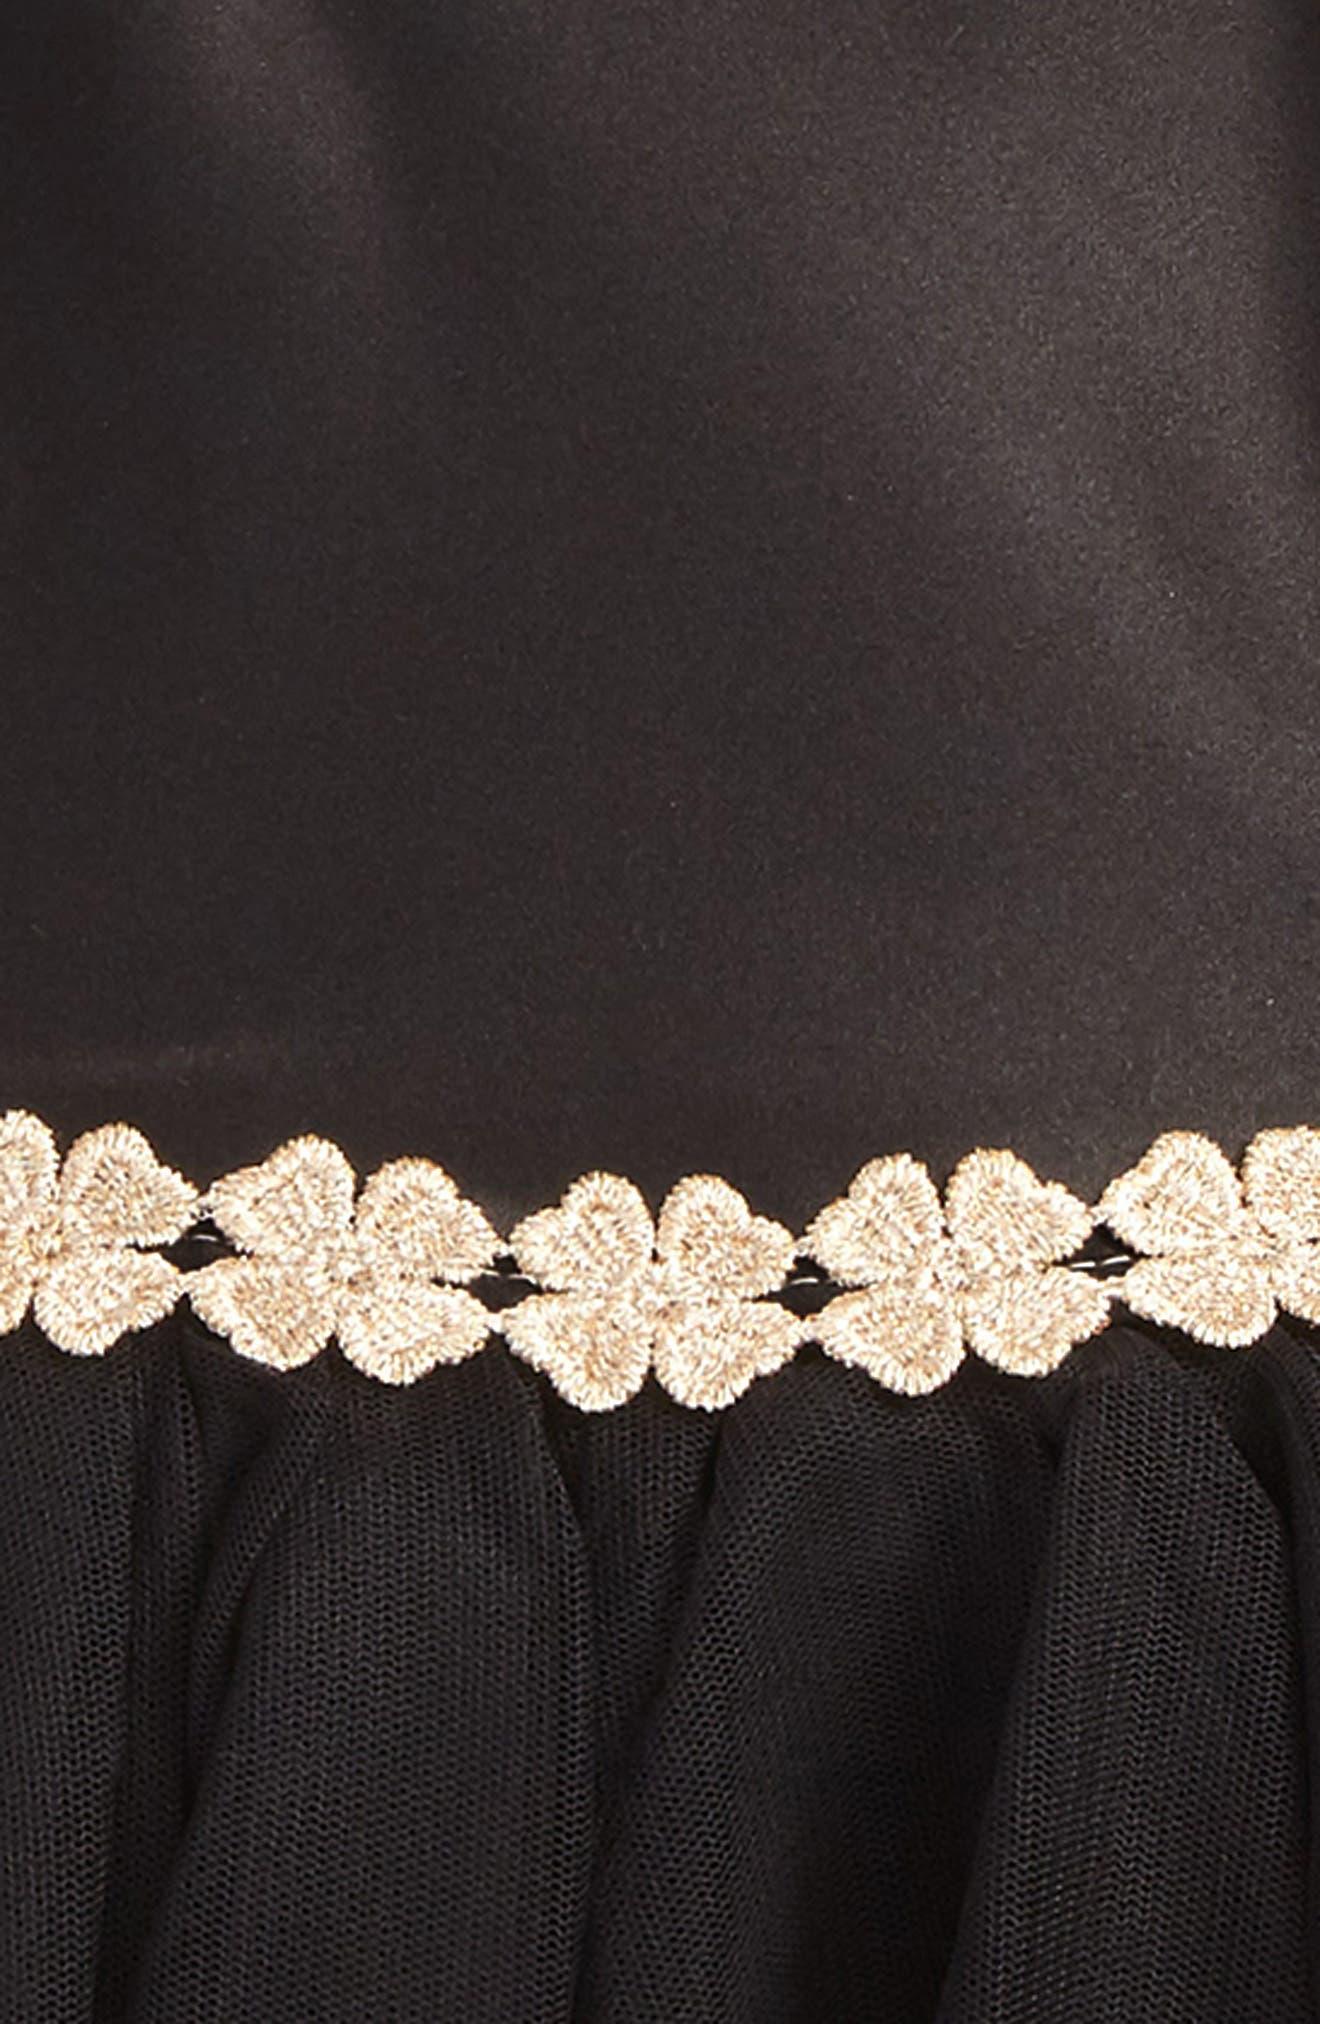 Satin & Tulle Dress,                             Alternate thumbnail 2, color,                             001